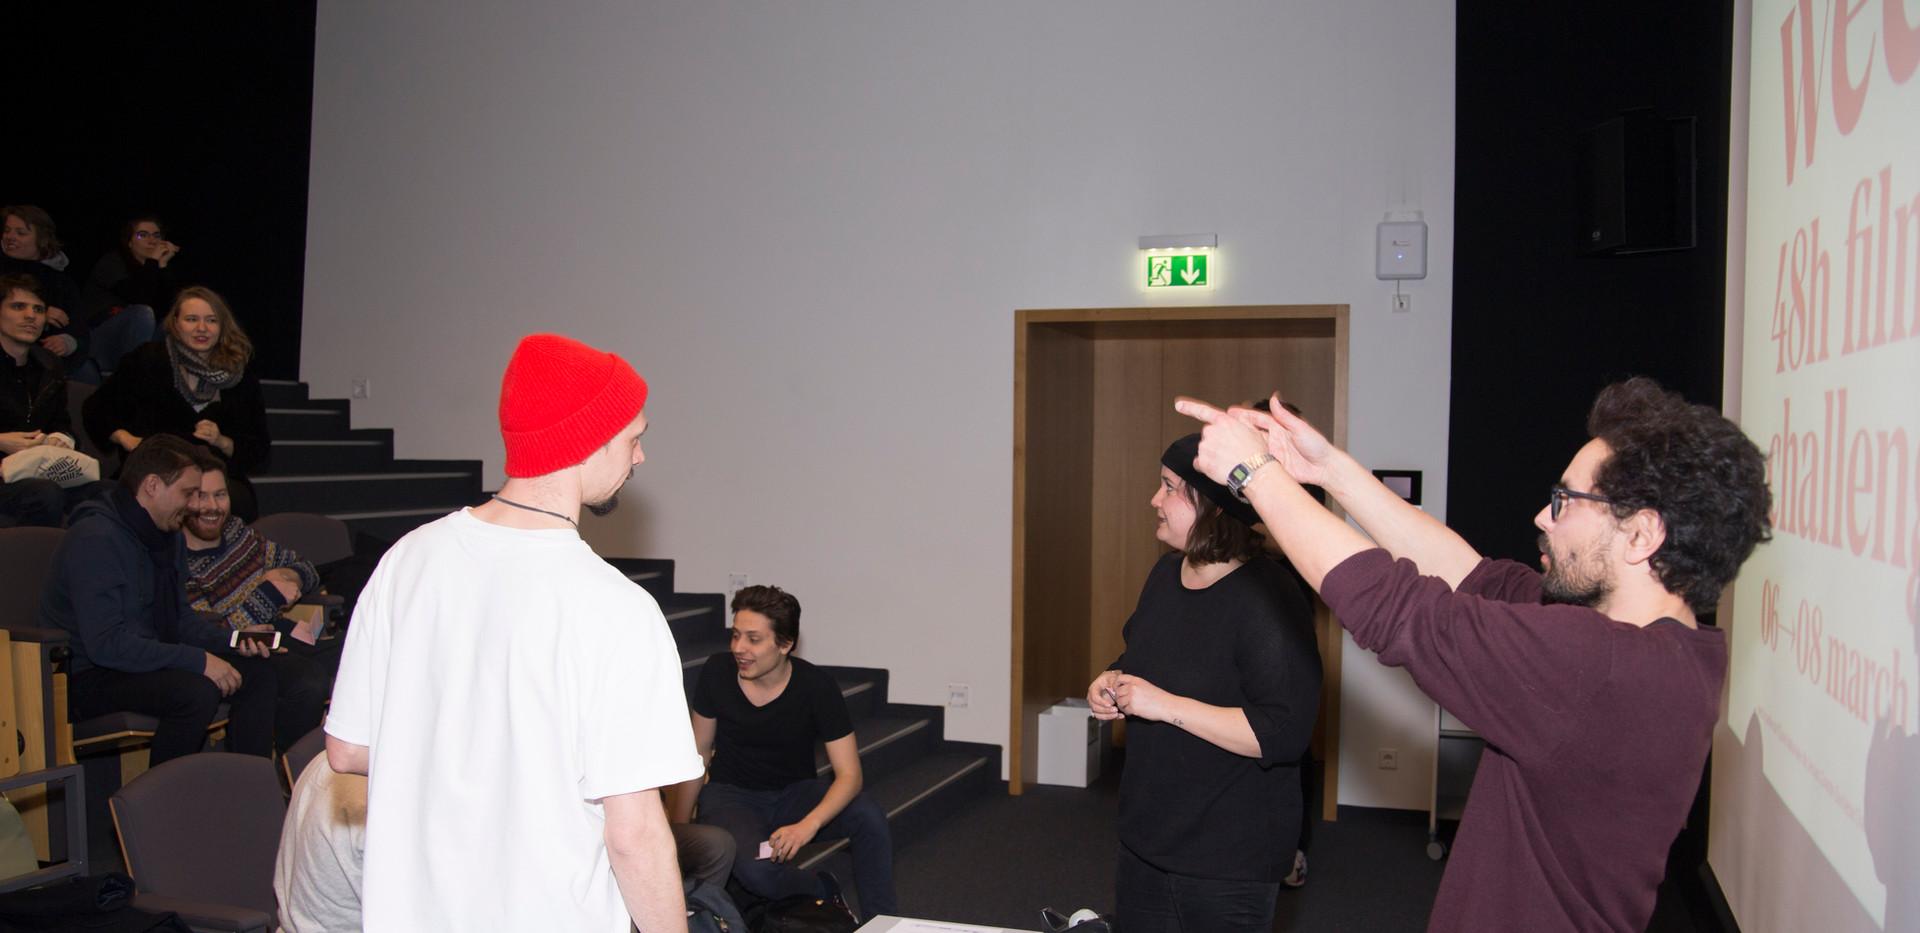 Behind the scenes - LW2020